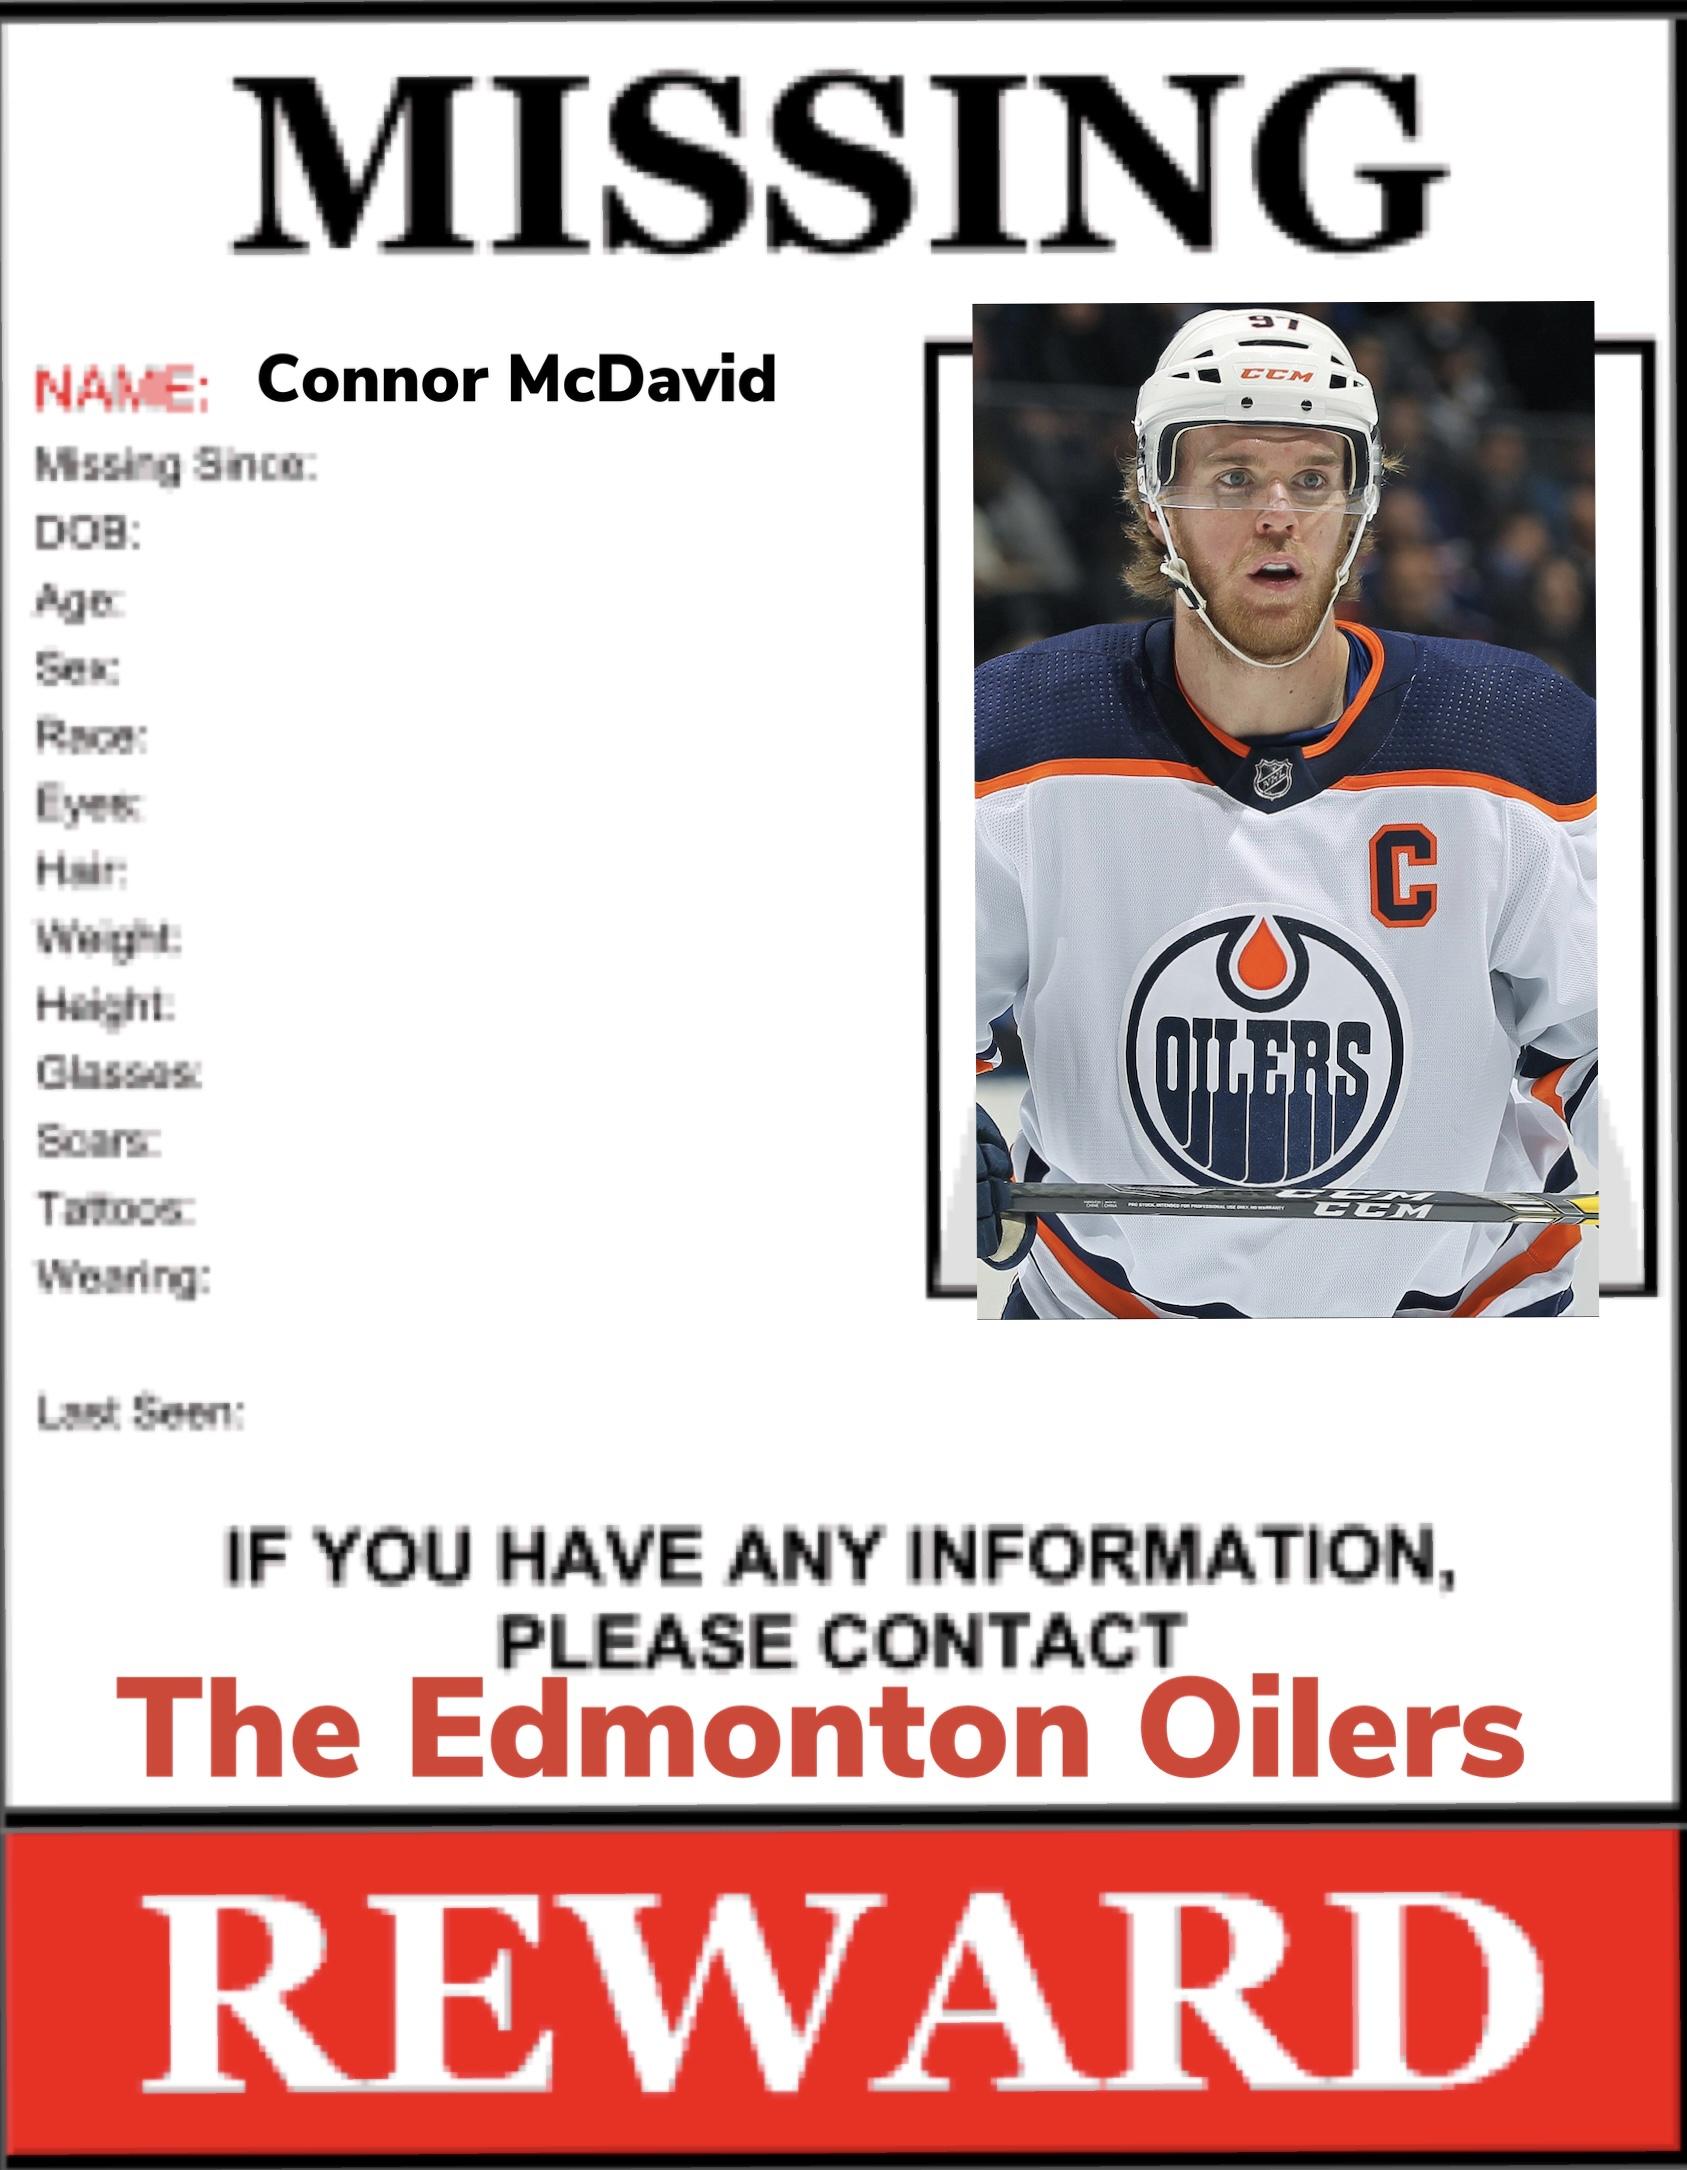 Missing: Connor McDavid